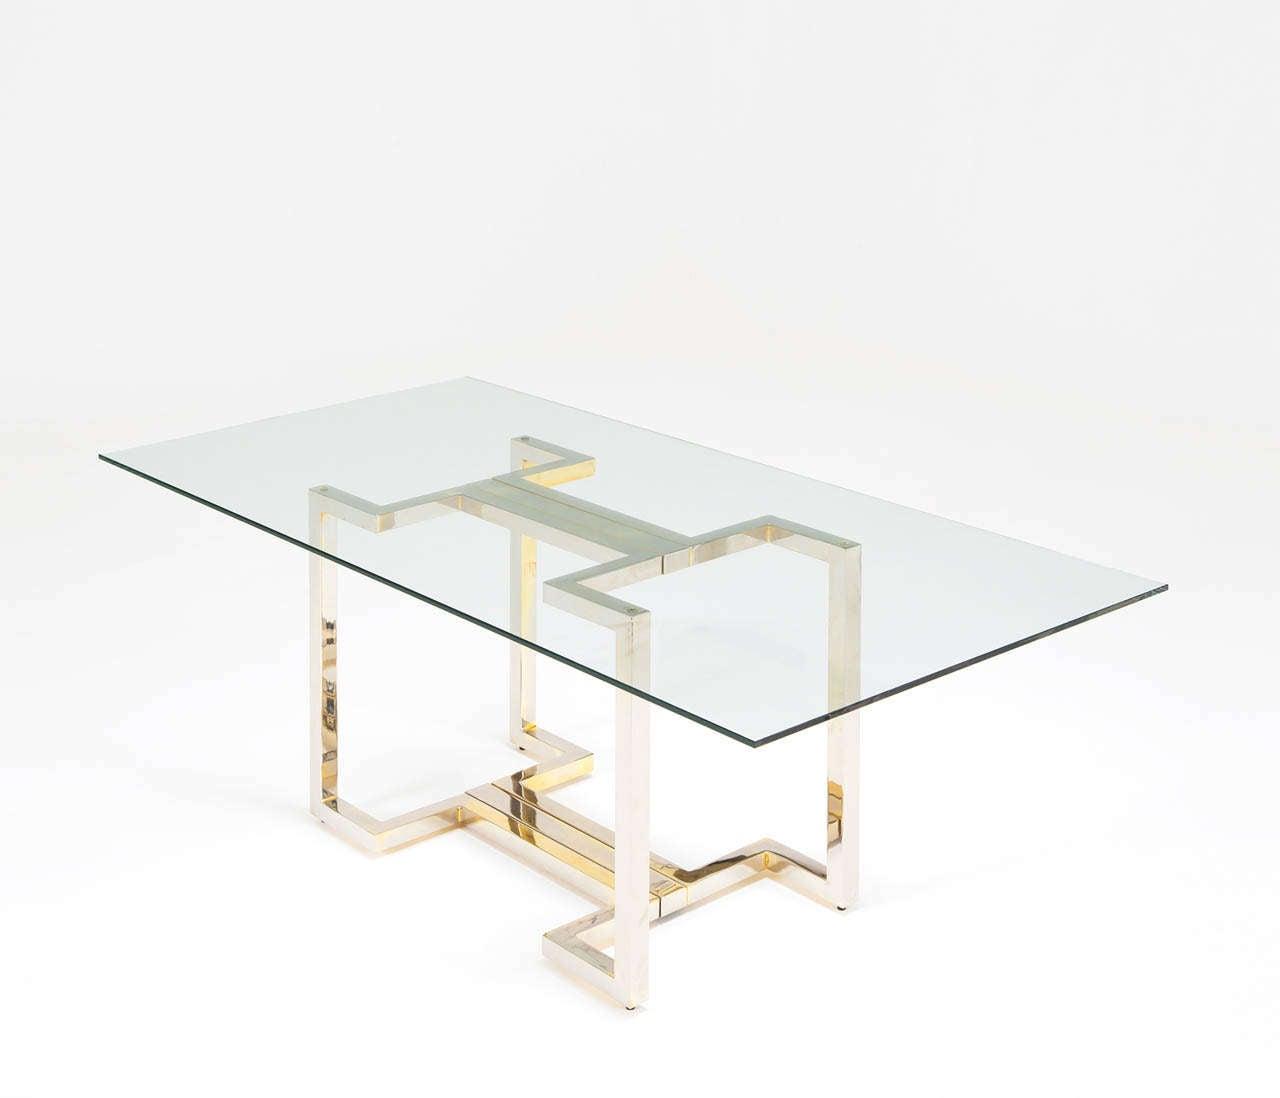 sculptural brass and chrome table base for sale at 1stdibs. Black Bedroom Furniture Sets. Home Design Ideas